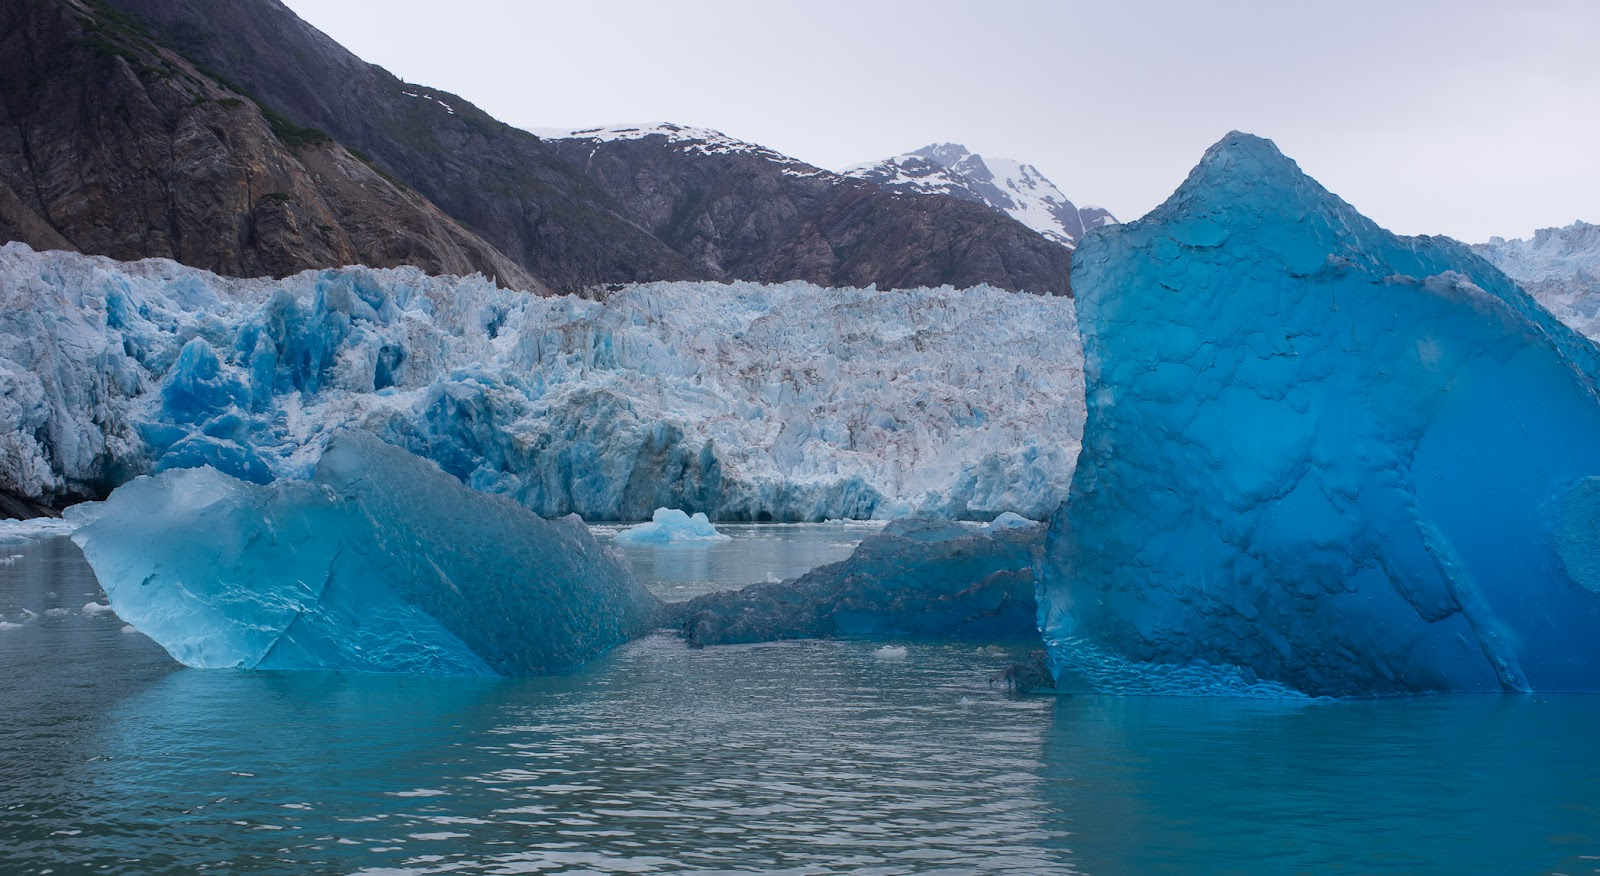 Jeremy Bears Tracy Arm Fjord South East Alaska - Tracy arm fjord